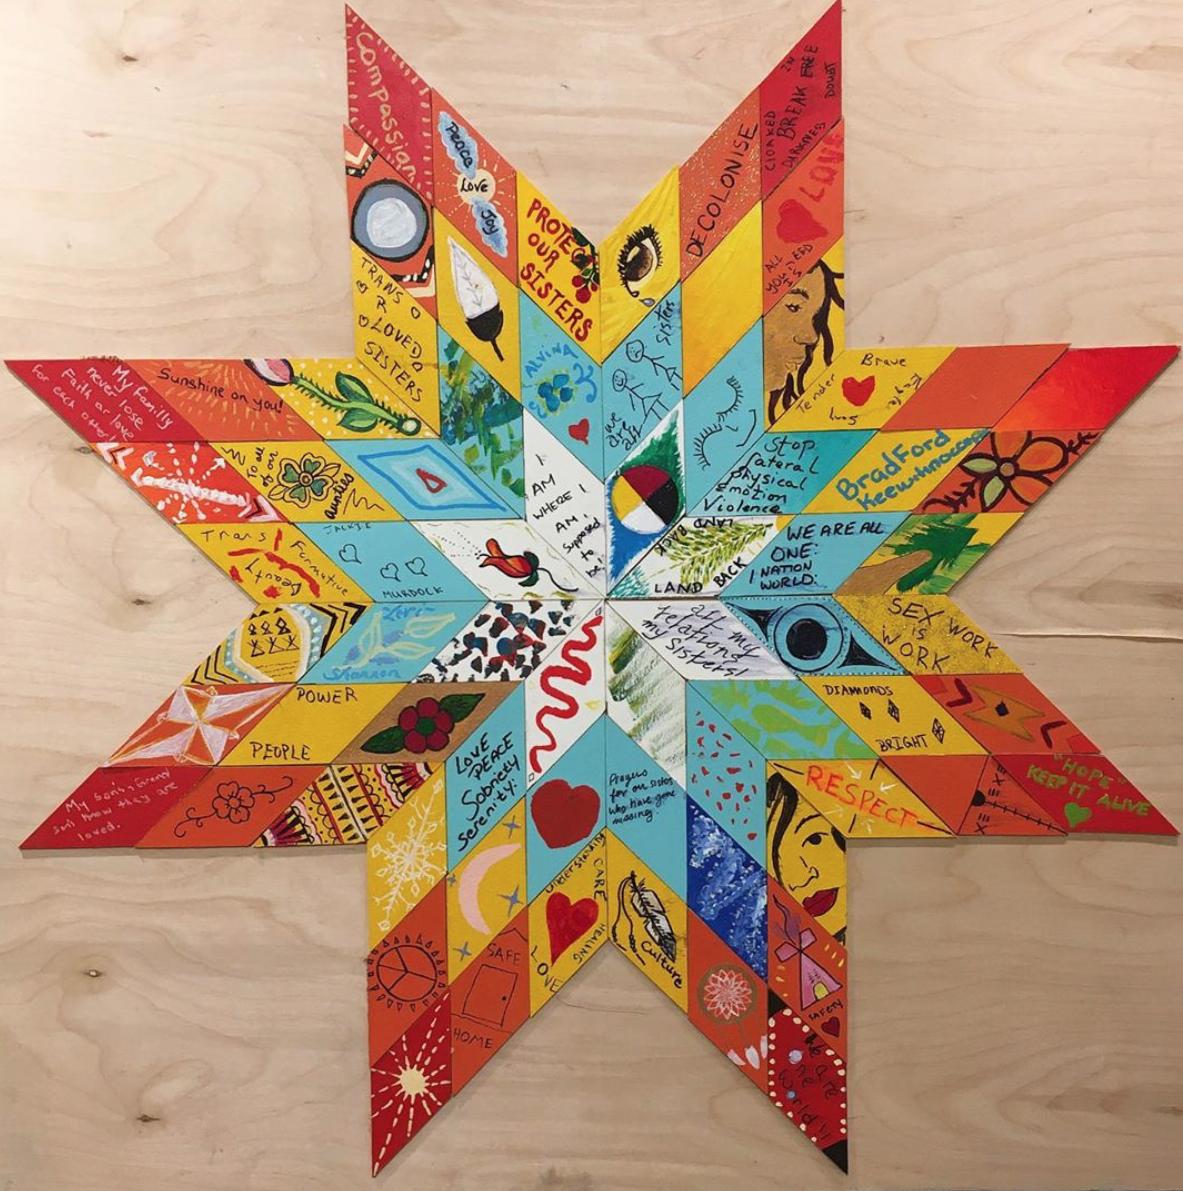 Wish Upon a Star Blanket Mural by Jeska Slater